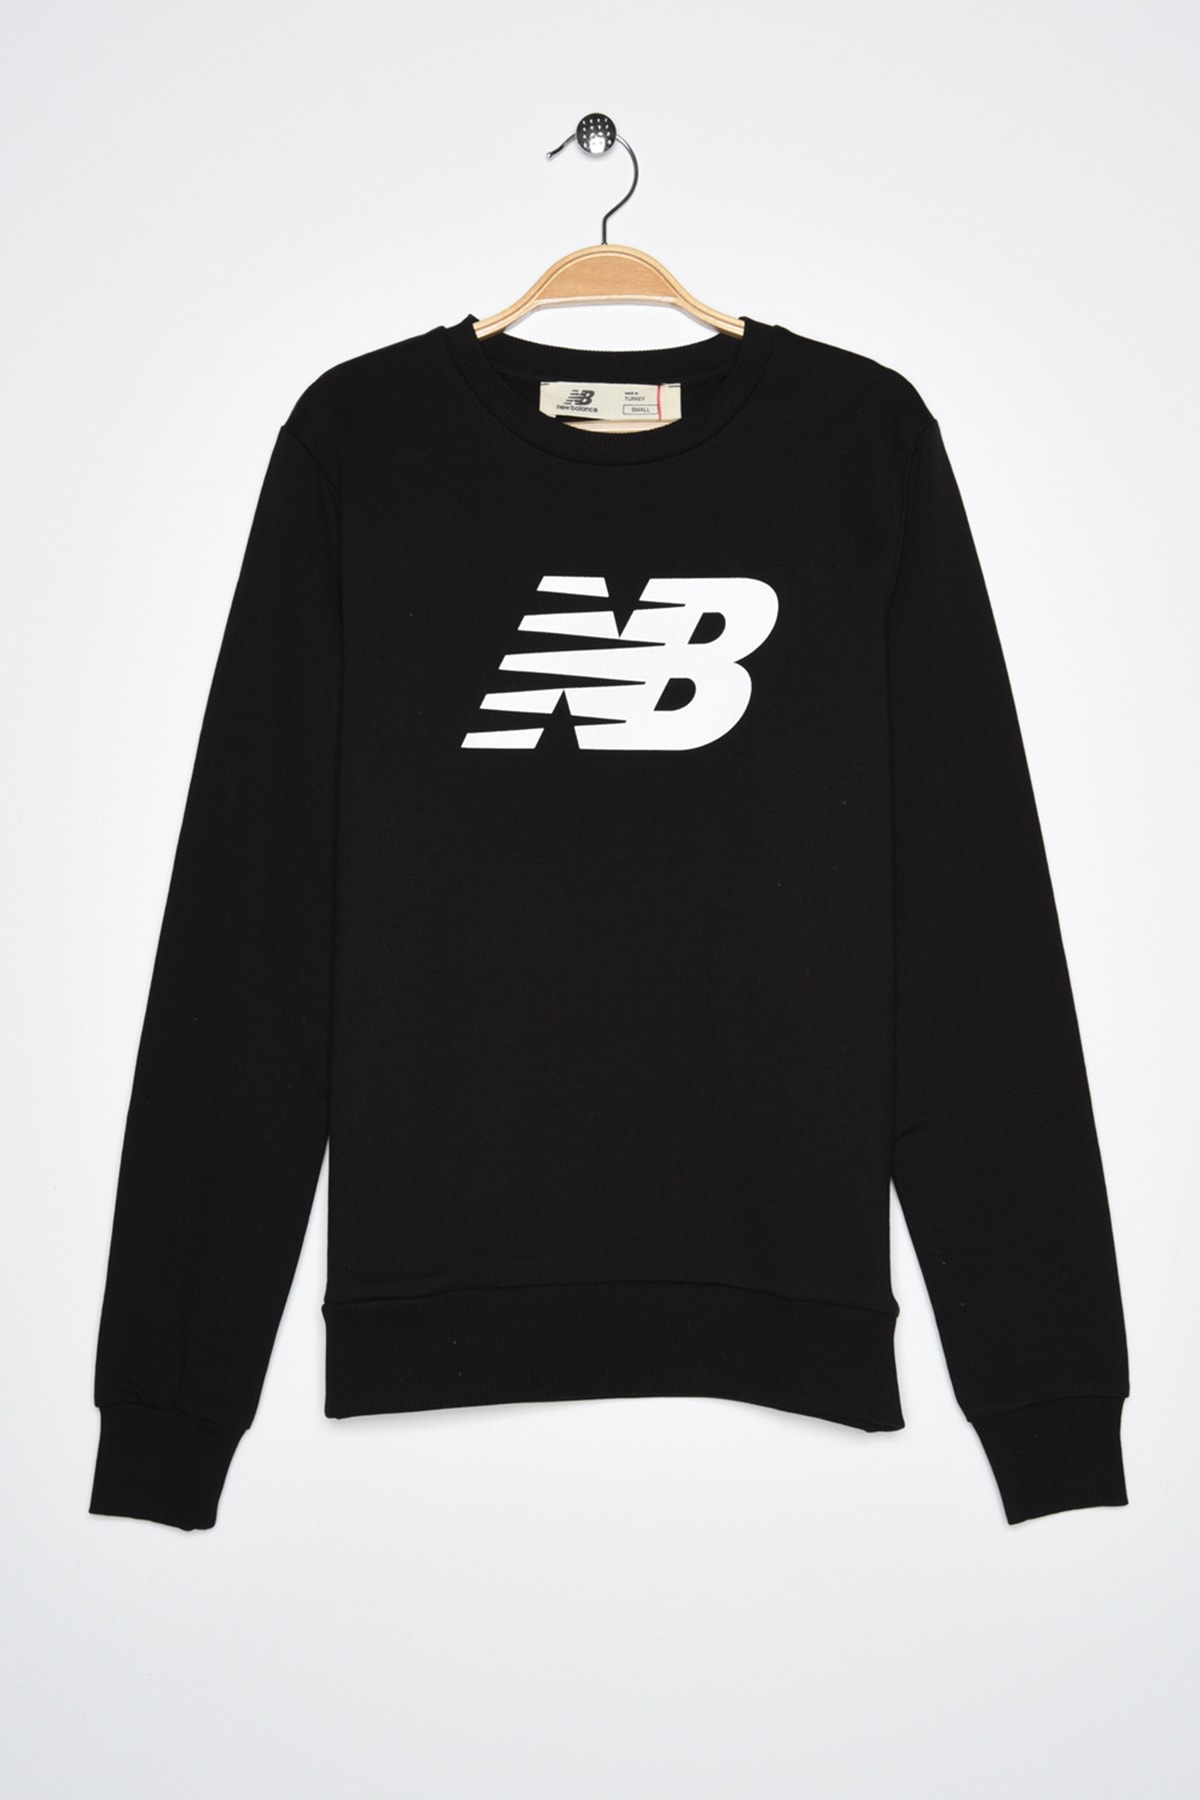 New Balance Kadın Spor Sweatshirt - CREW NECK  - WTC0303-BK 1